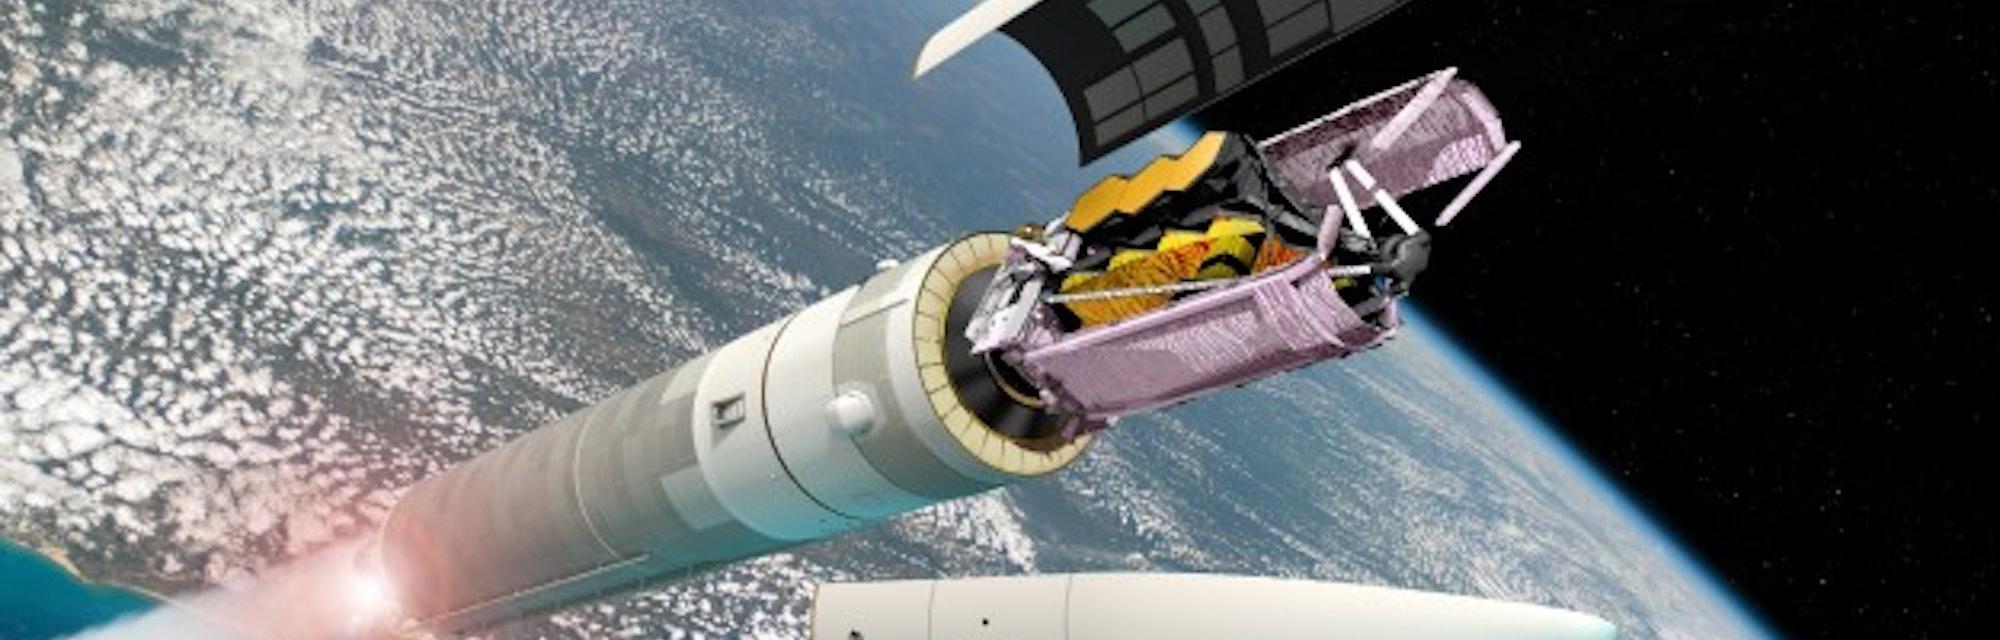 Webb illustration of post-launch faring shedding